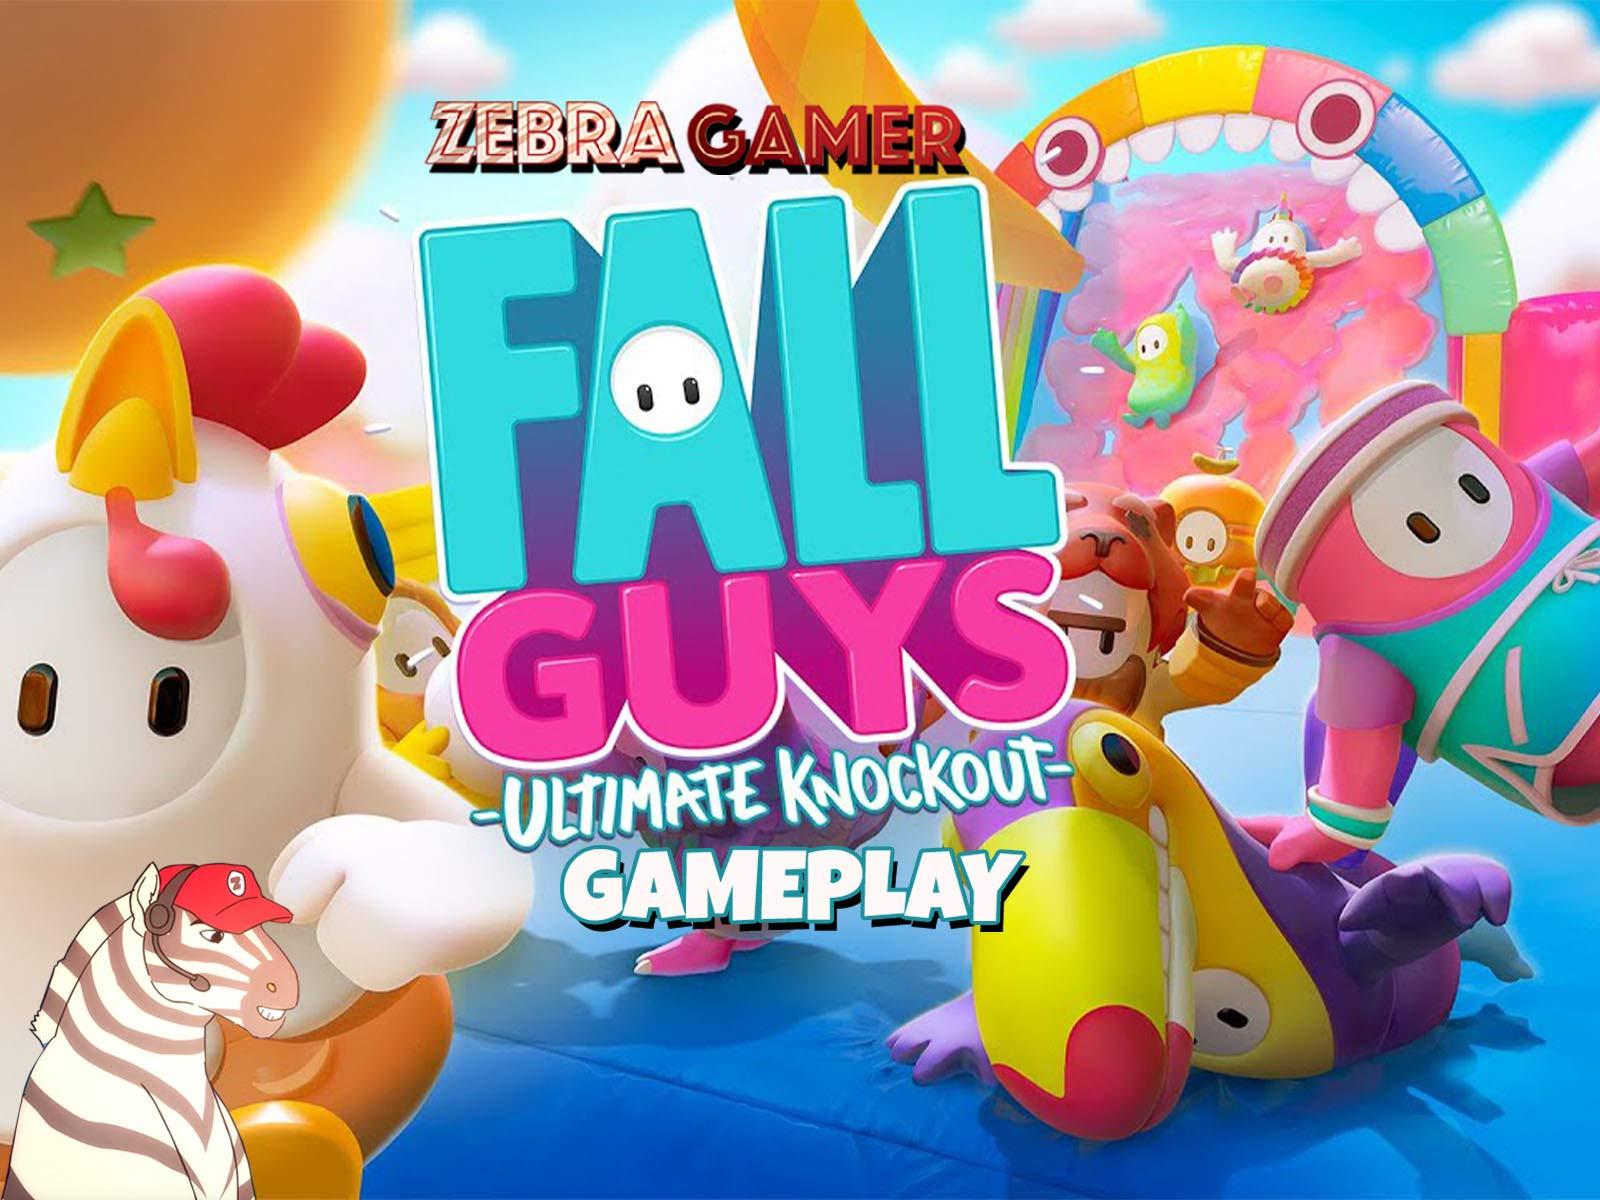 Clip: Fall Guys Ultimate Knockout Gameplay - Zebra Gamer - Season 1